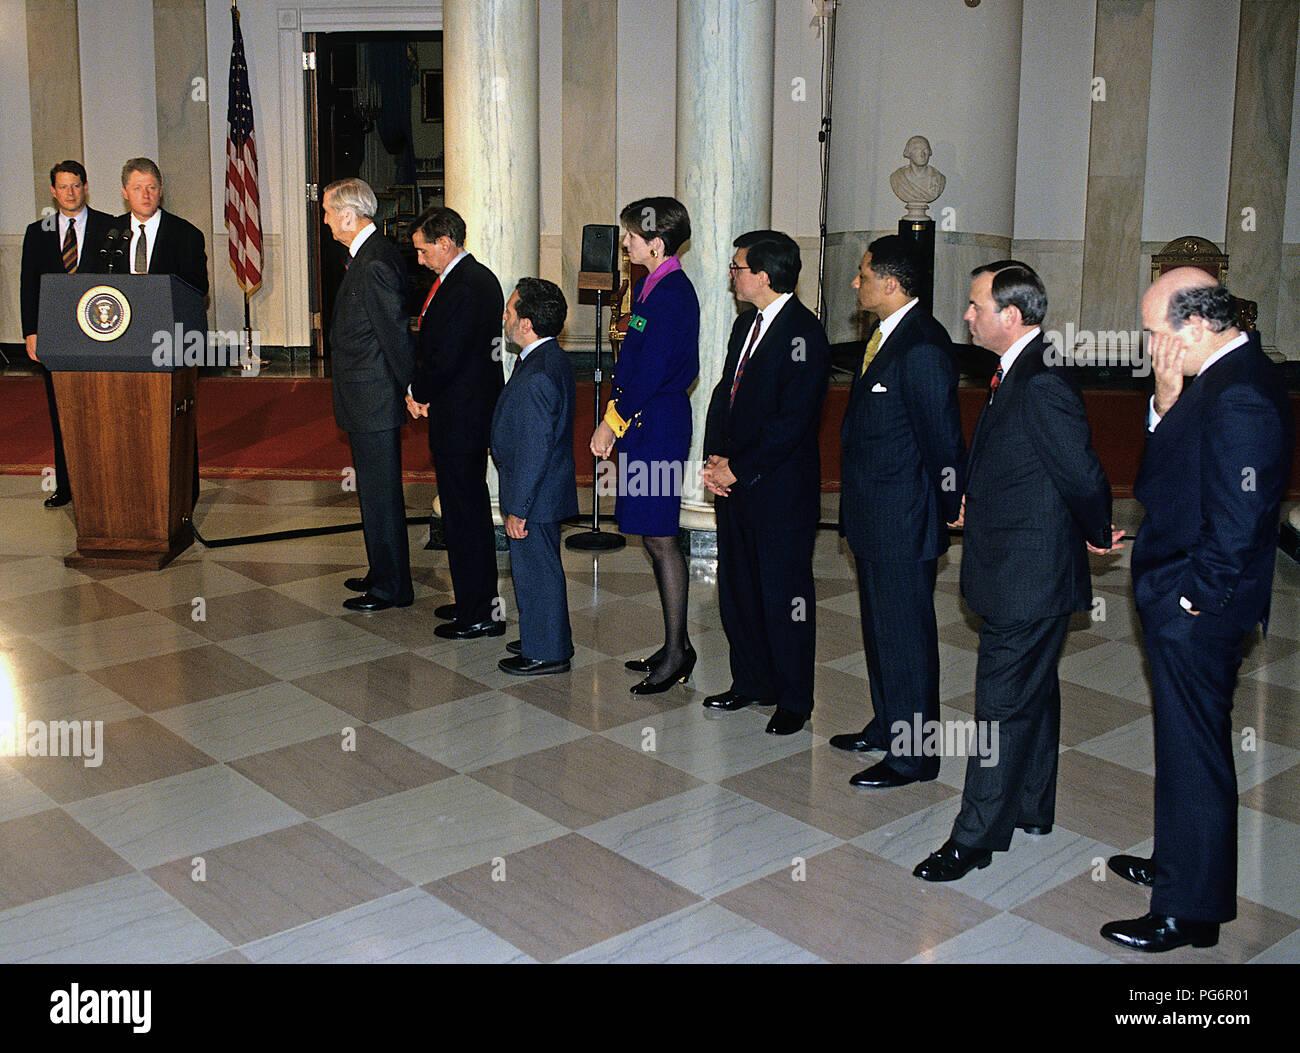 Washington Dc Usa November 17 1993 President William Jefferson